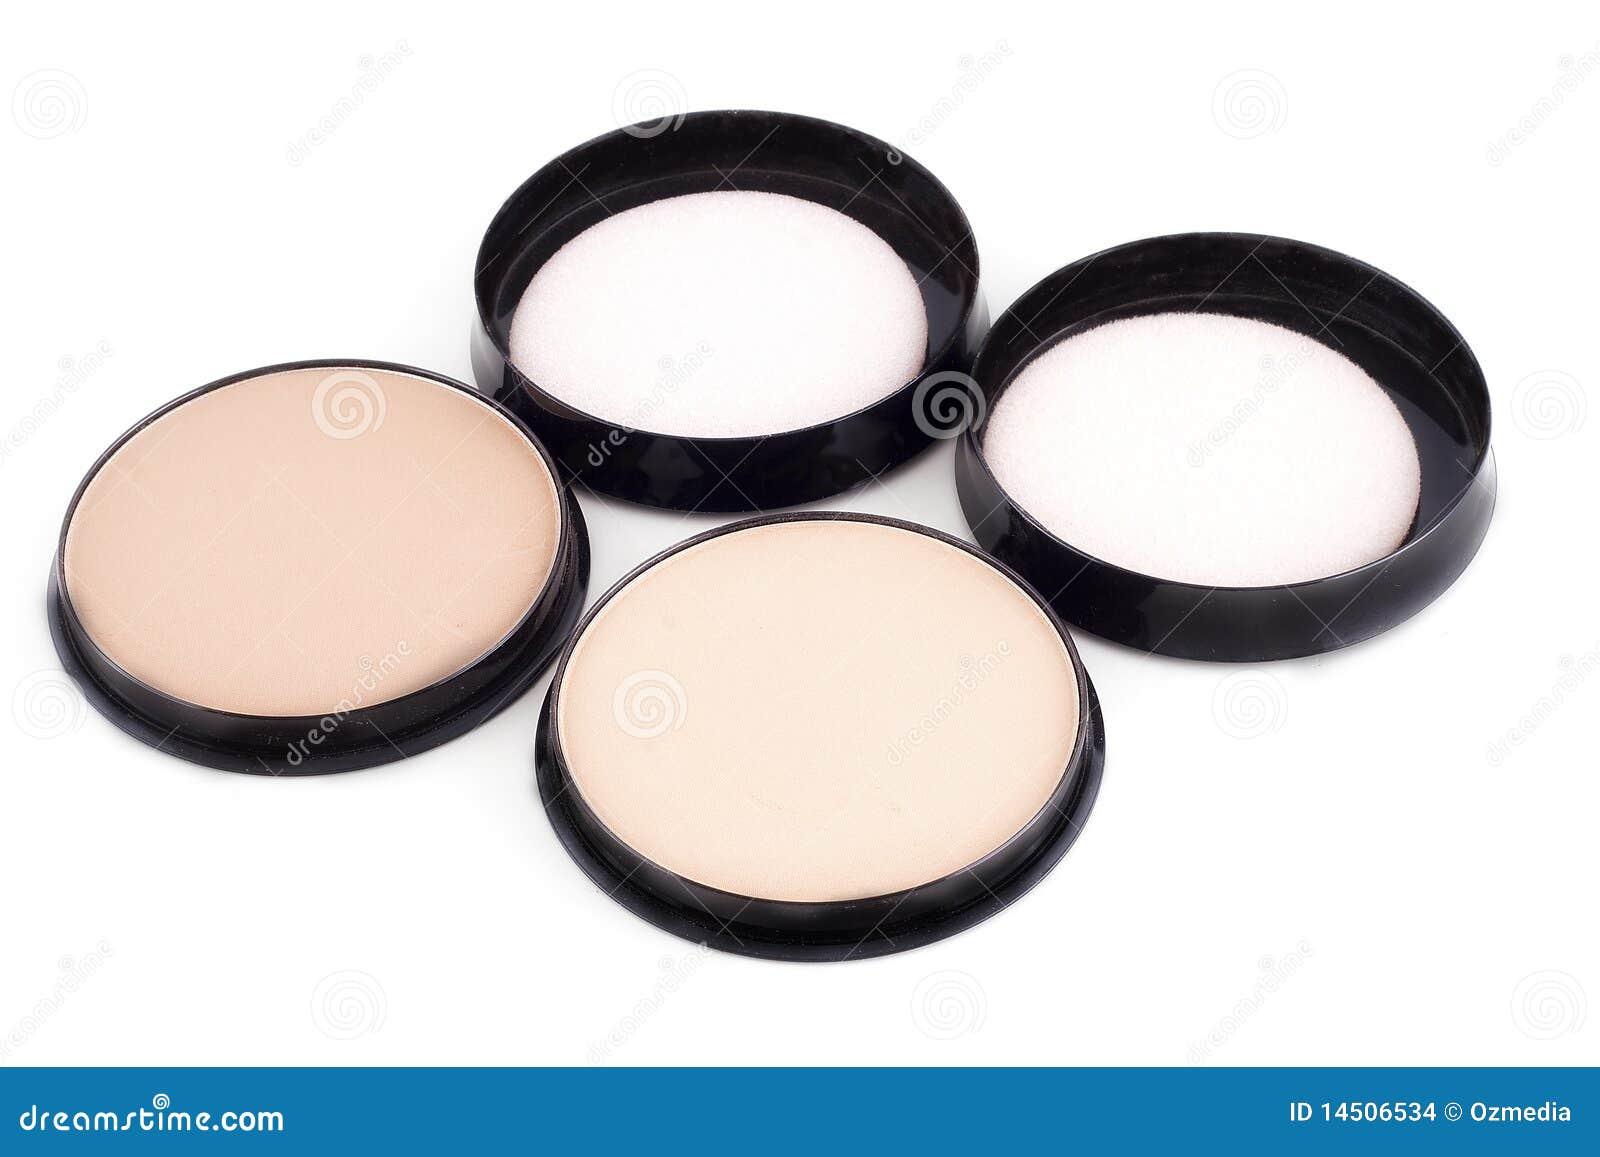 Accesorios cosméticos